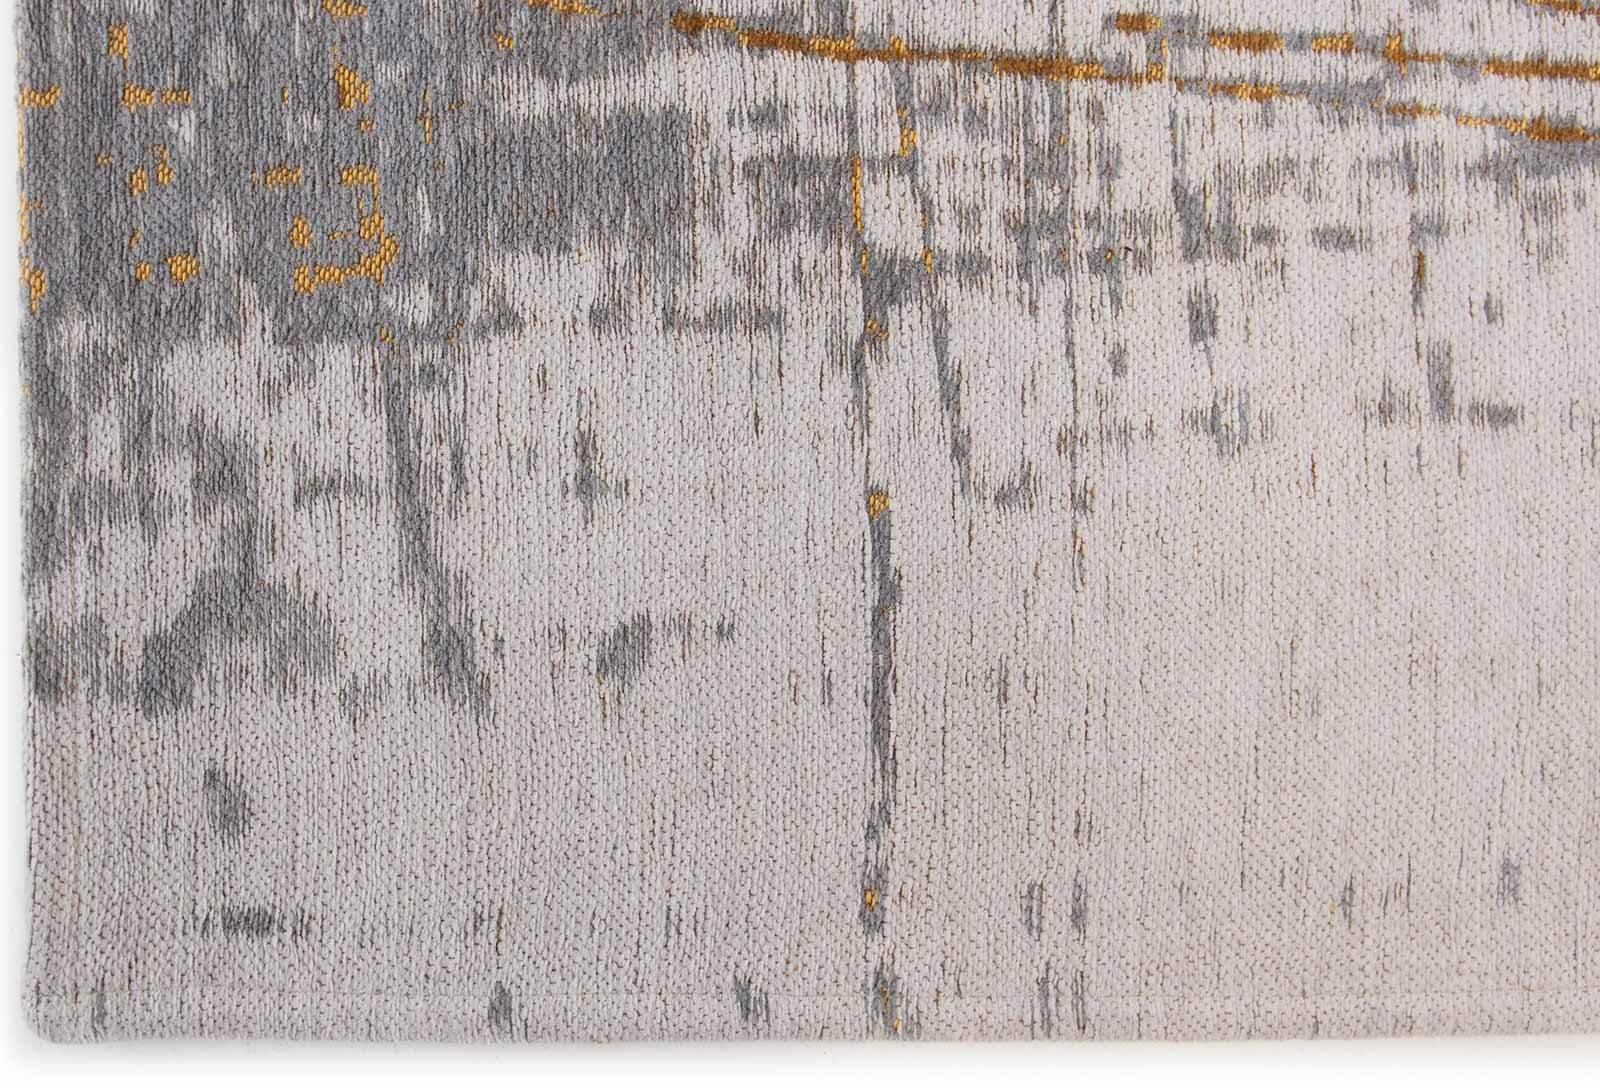 alfombras Louis De Poortere LX8419 Mad Men Griff Columbus Gold corner